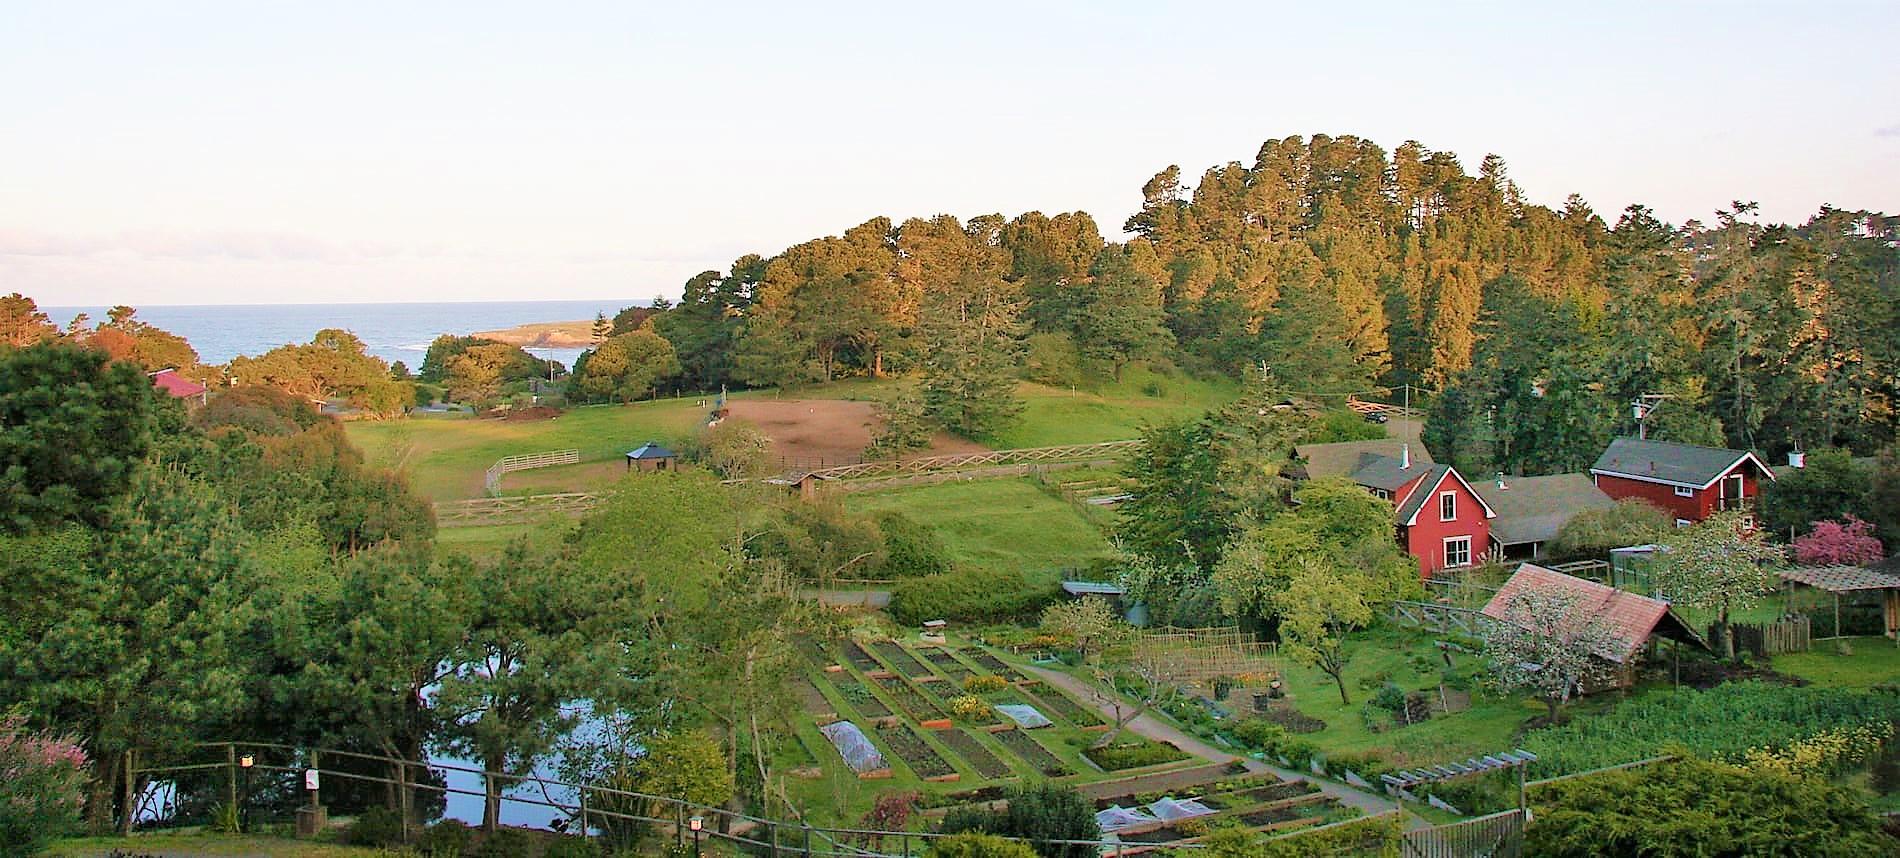 organic gardens at the stanford inn mendocino coast hotel & resort